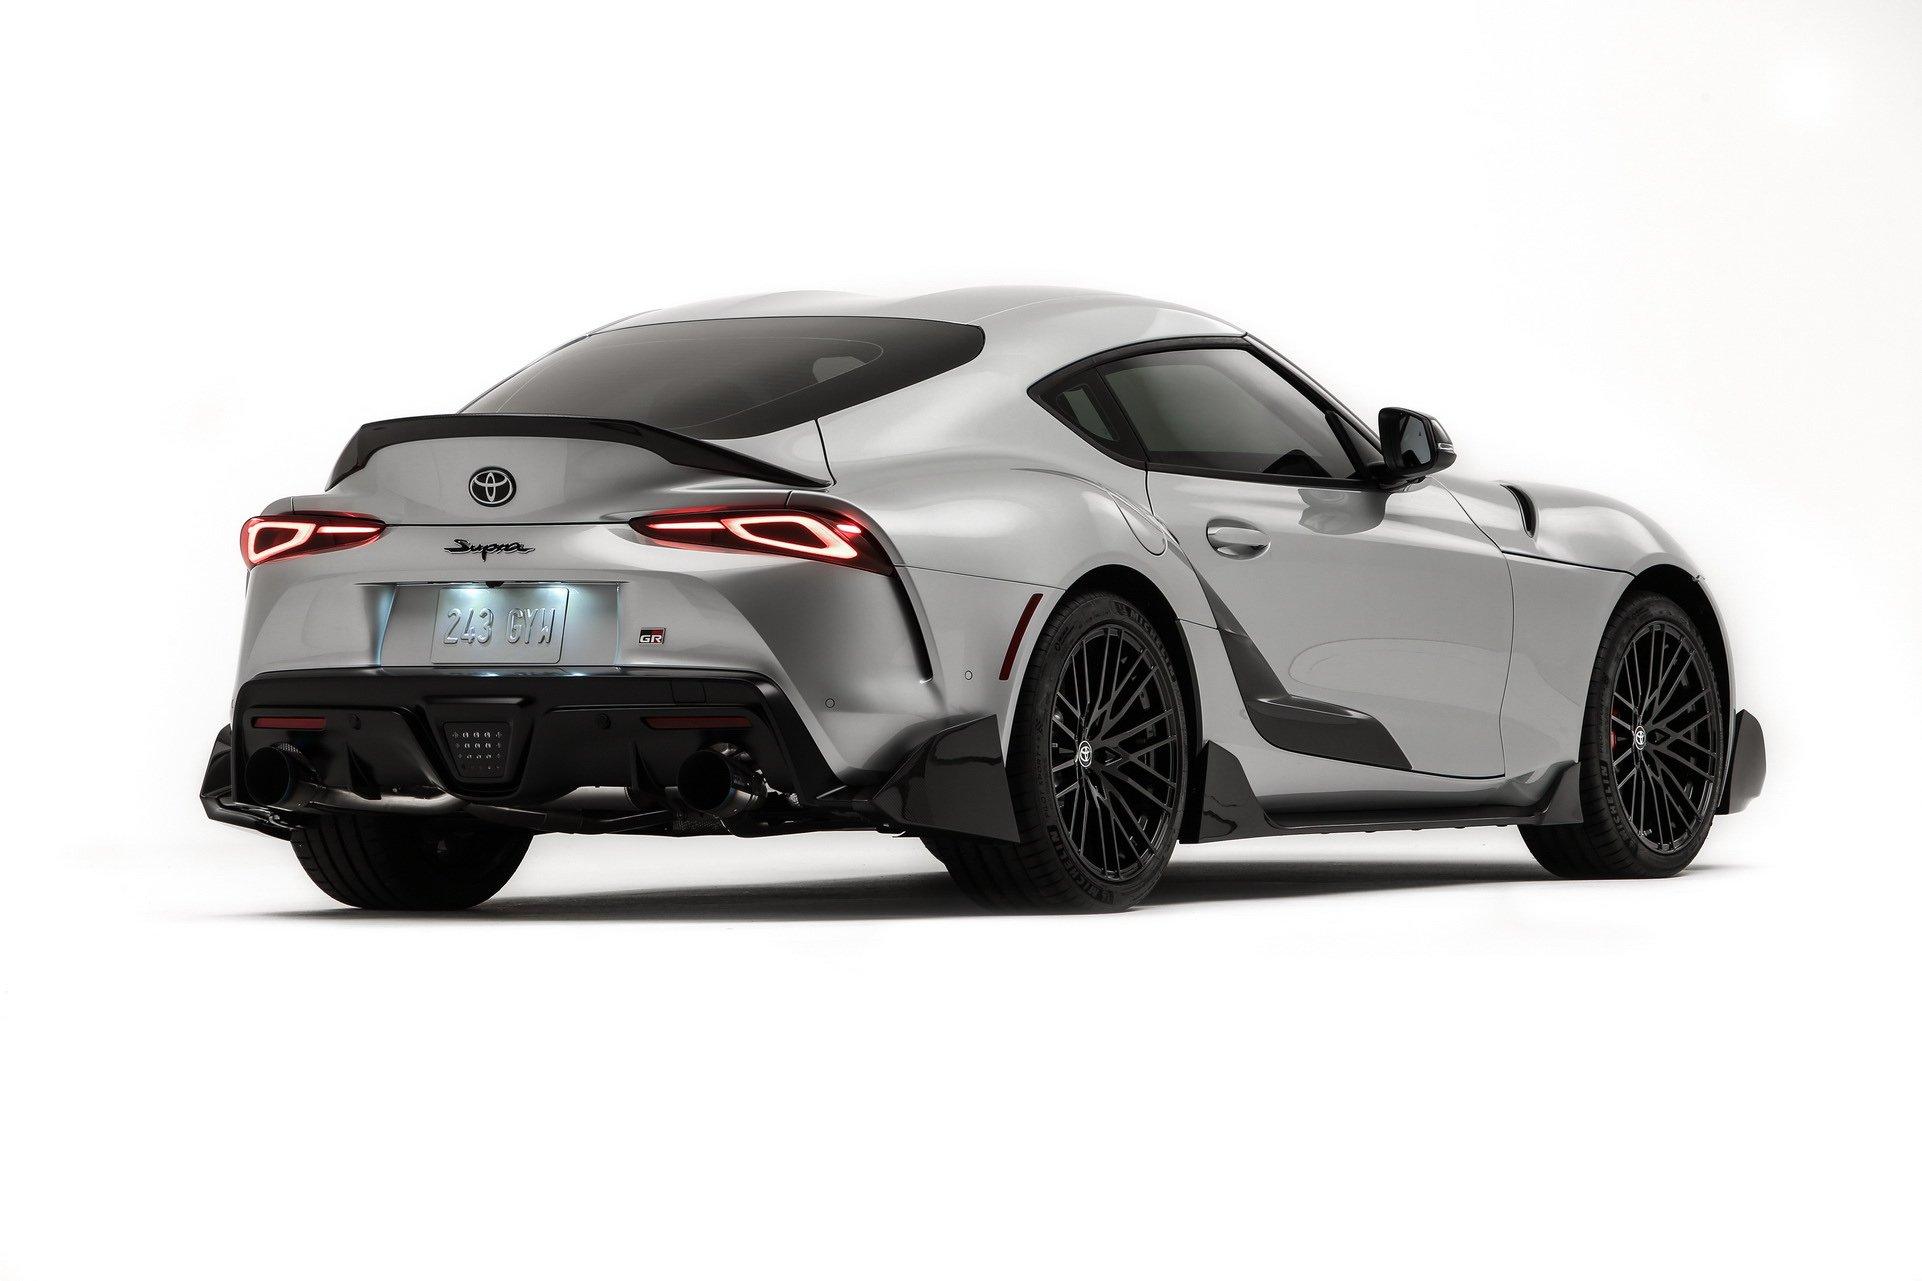 2020-Toyota-GR-Supra-Performance-Line-Concept2